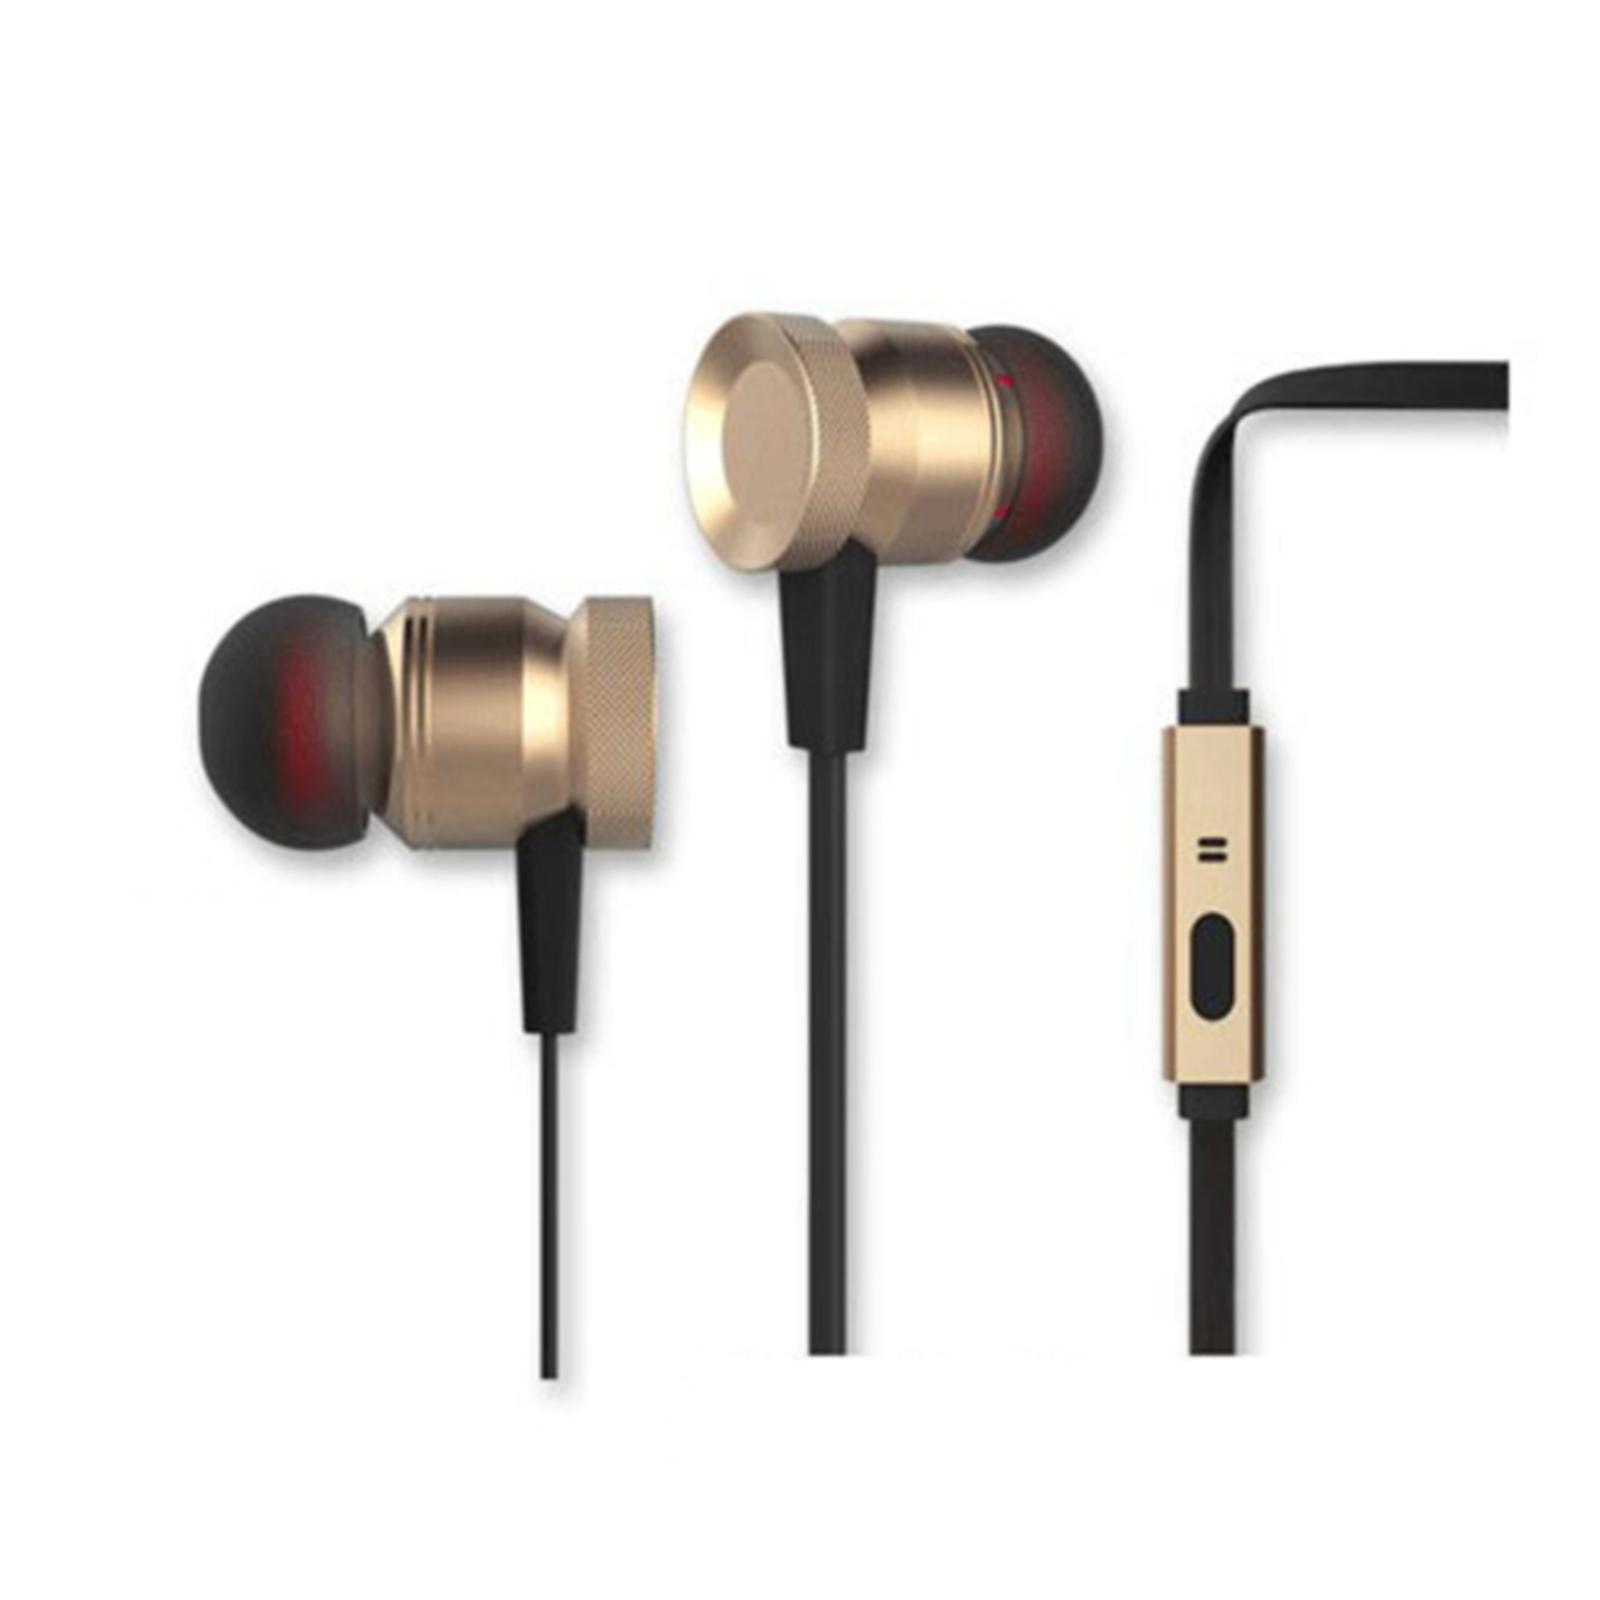 Sansai Metallic Gold Stereo Earphones/Headphones w/ Mic Headset for iPhone